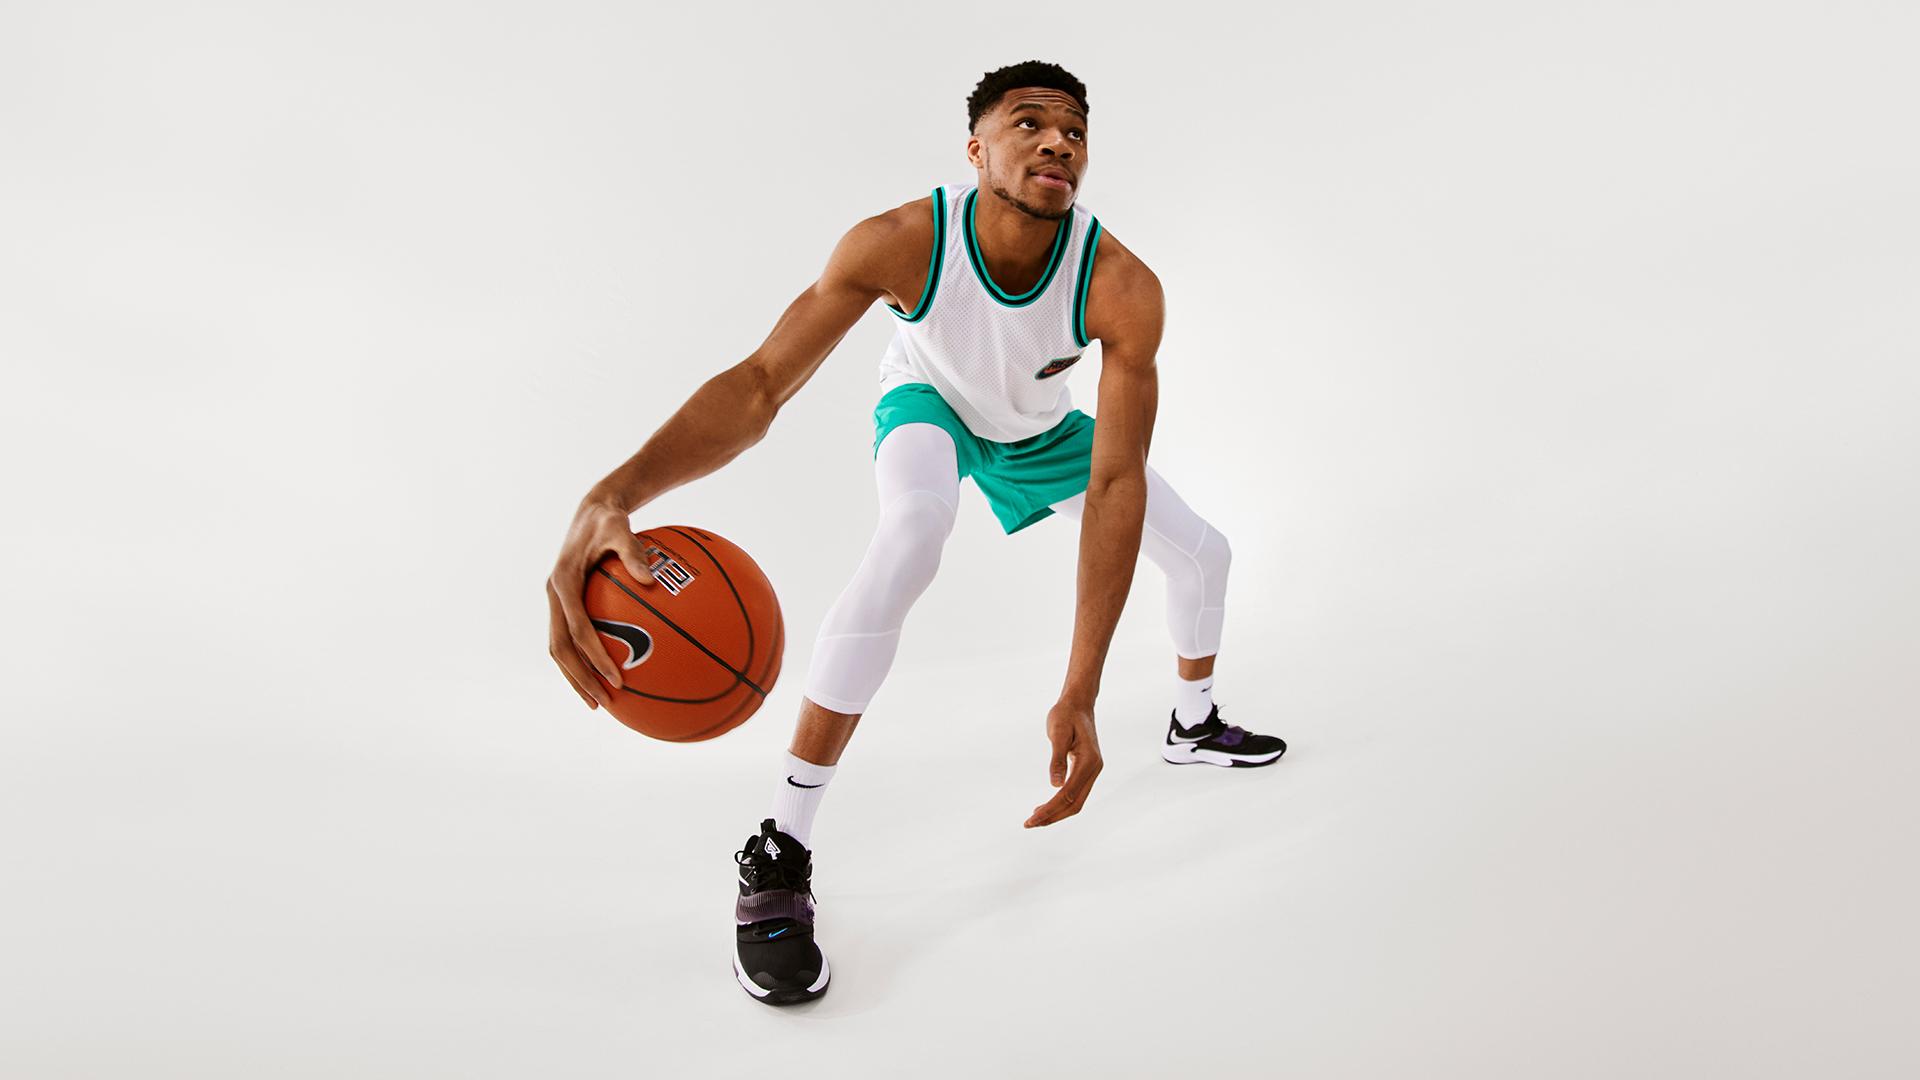 Giannis Antetokounmpo Nike Basketball Unveils Zoom Freak 3 Third Signature Shoe Of Milwaukee Bucks Superstar Nba Com Canada The Official Site Of The Nba